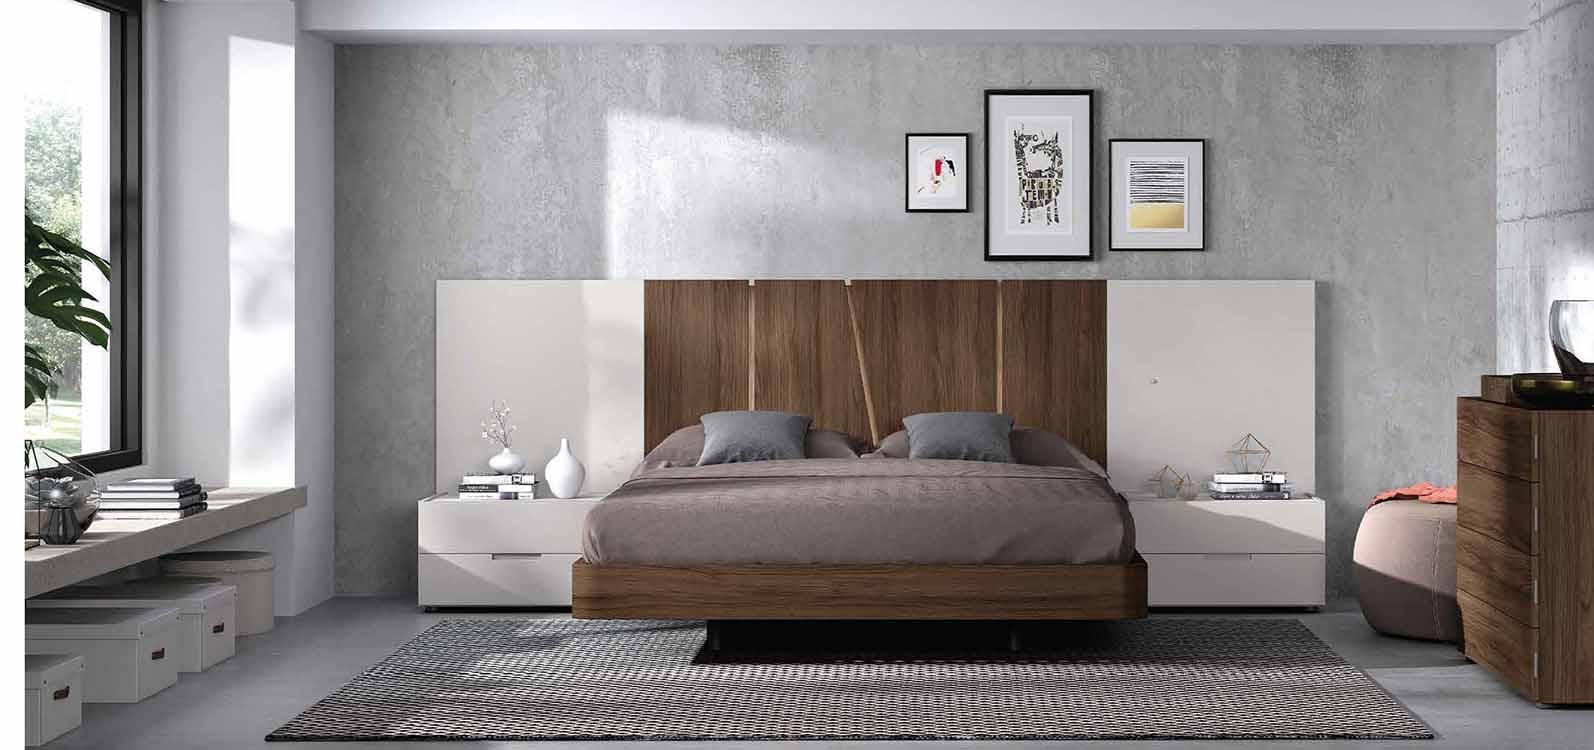 http://www.munozmuebles.net/nueva/catalogo/dormitorios1-2253-aro-4.jpg - Mueble  color turquesa